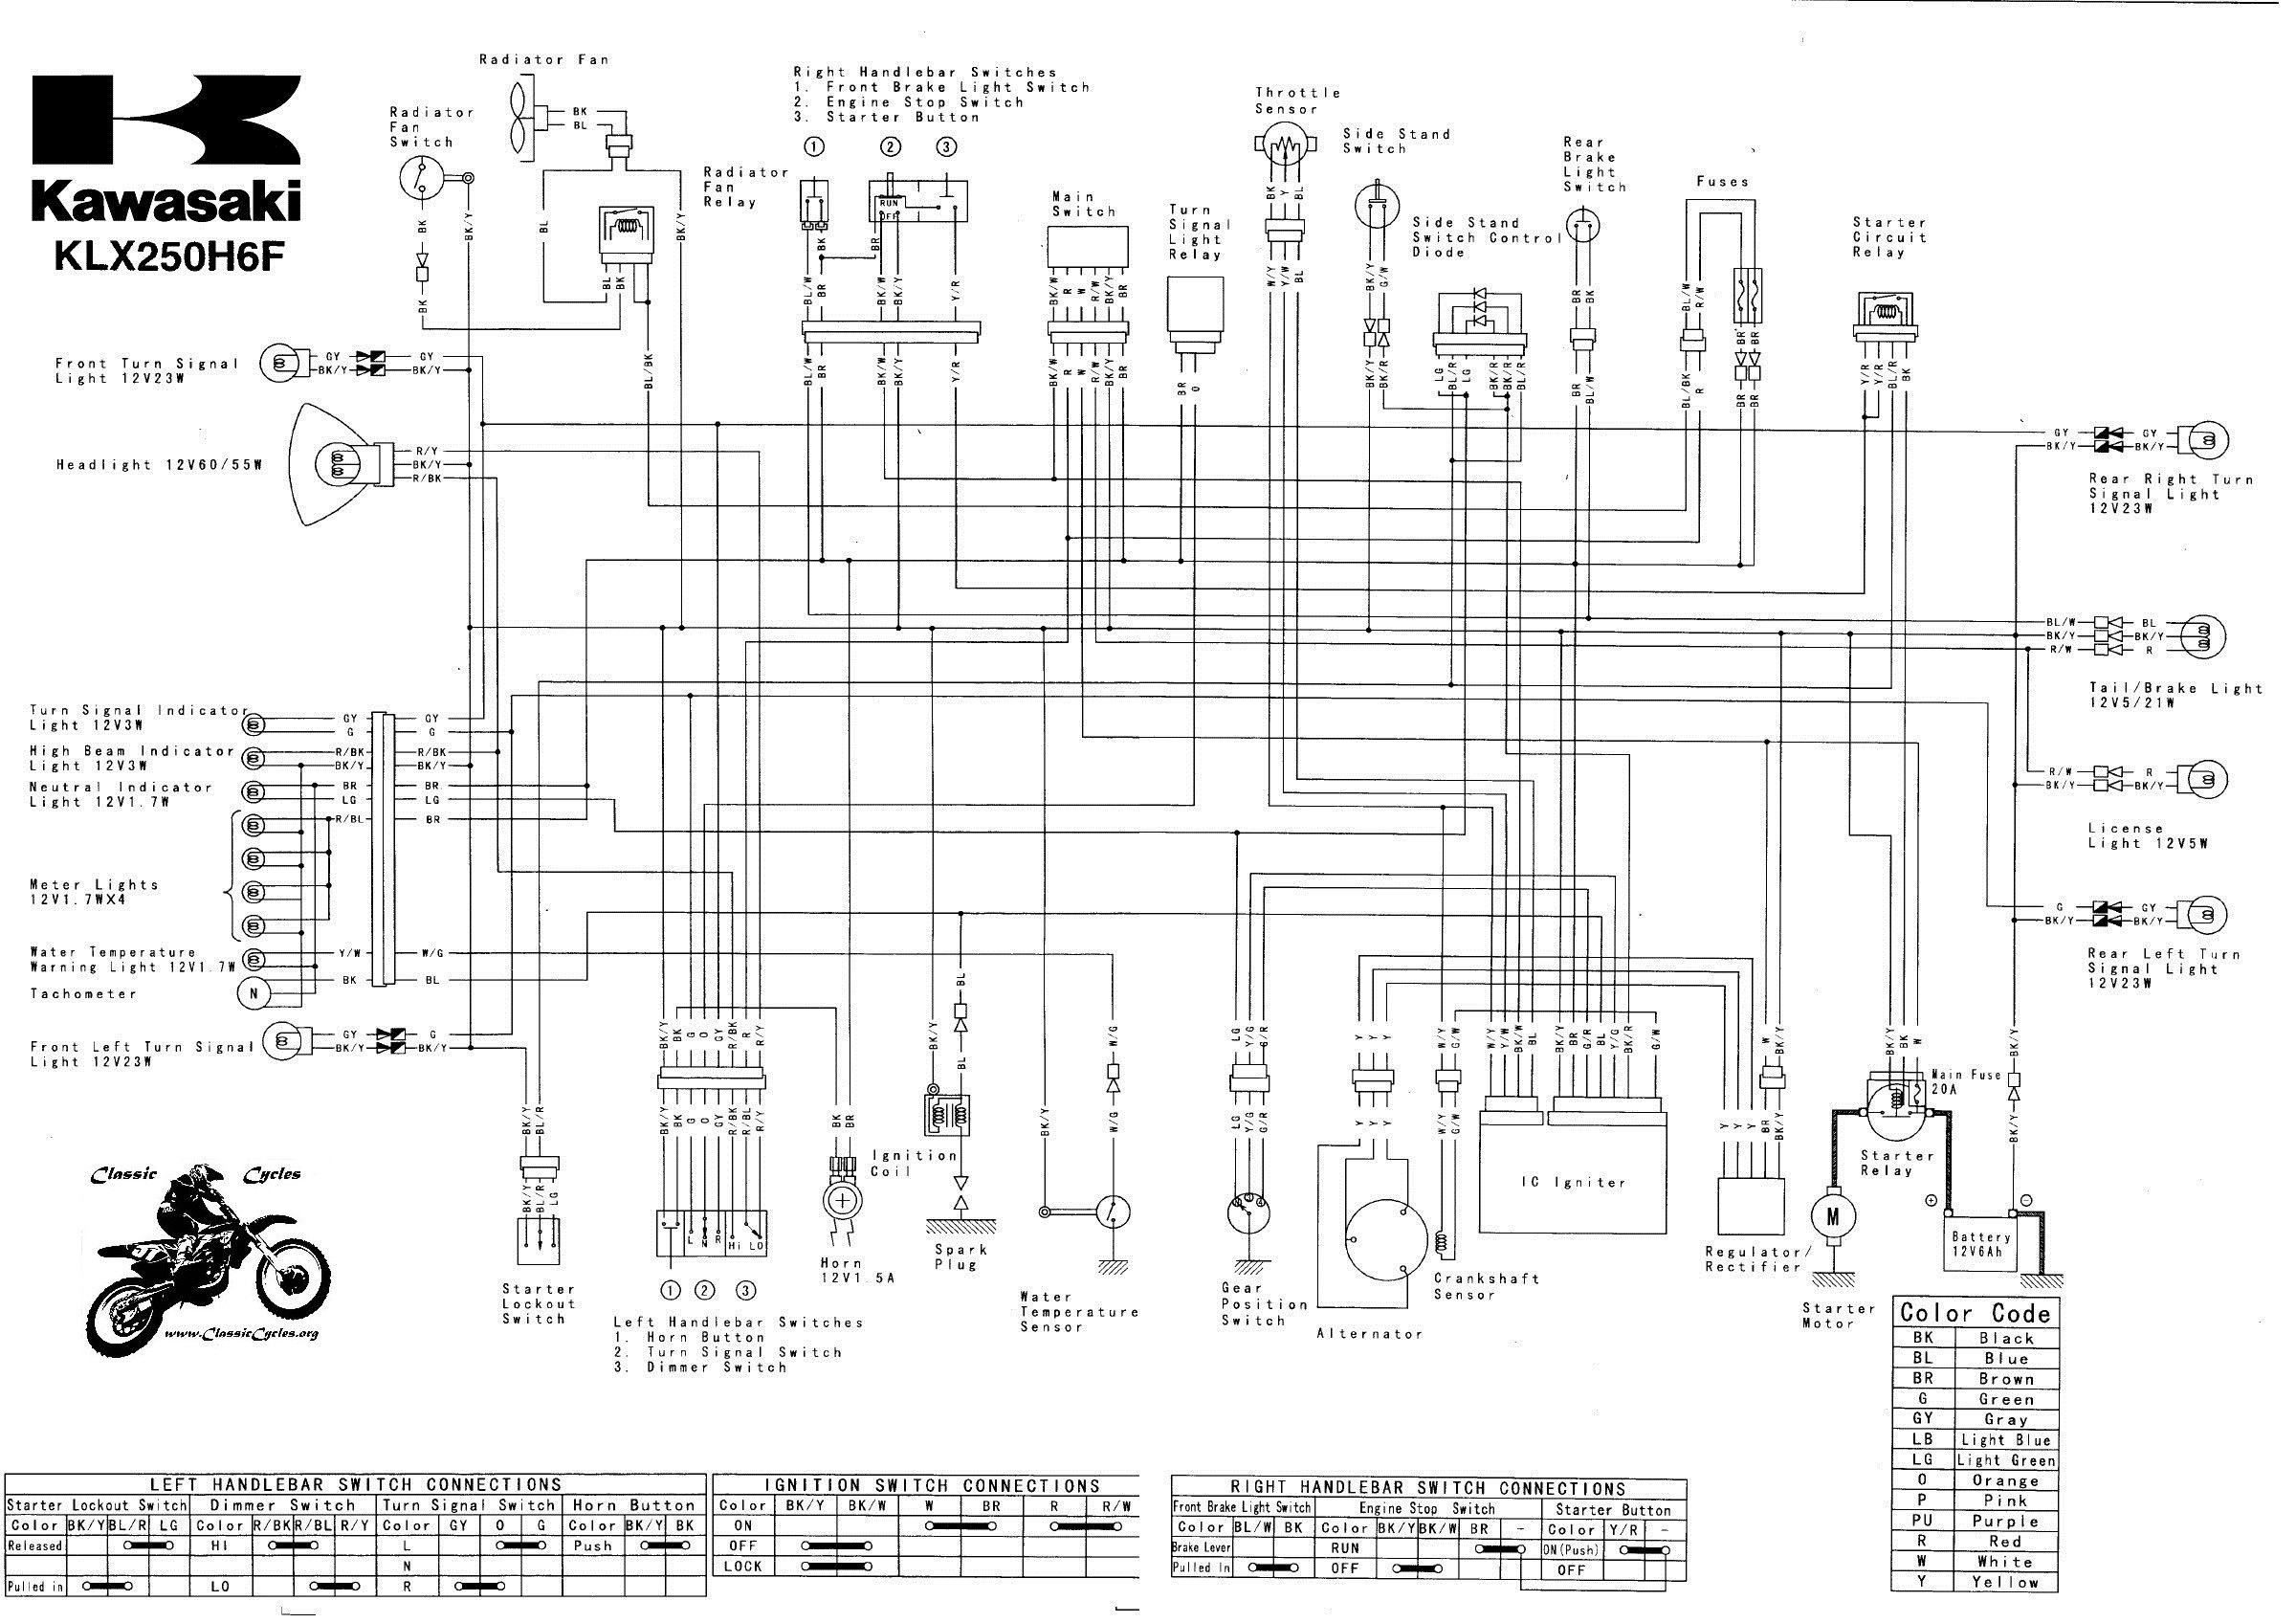 kawasaki wire diagram | skip-concepti wiring diagram number -  skip-concepti.garbobar.it  garbo bar